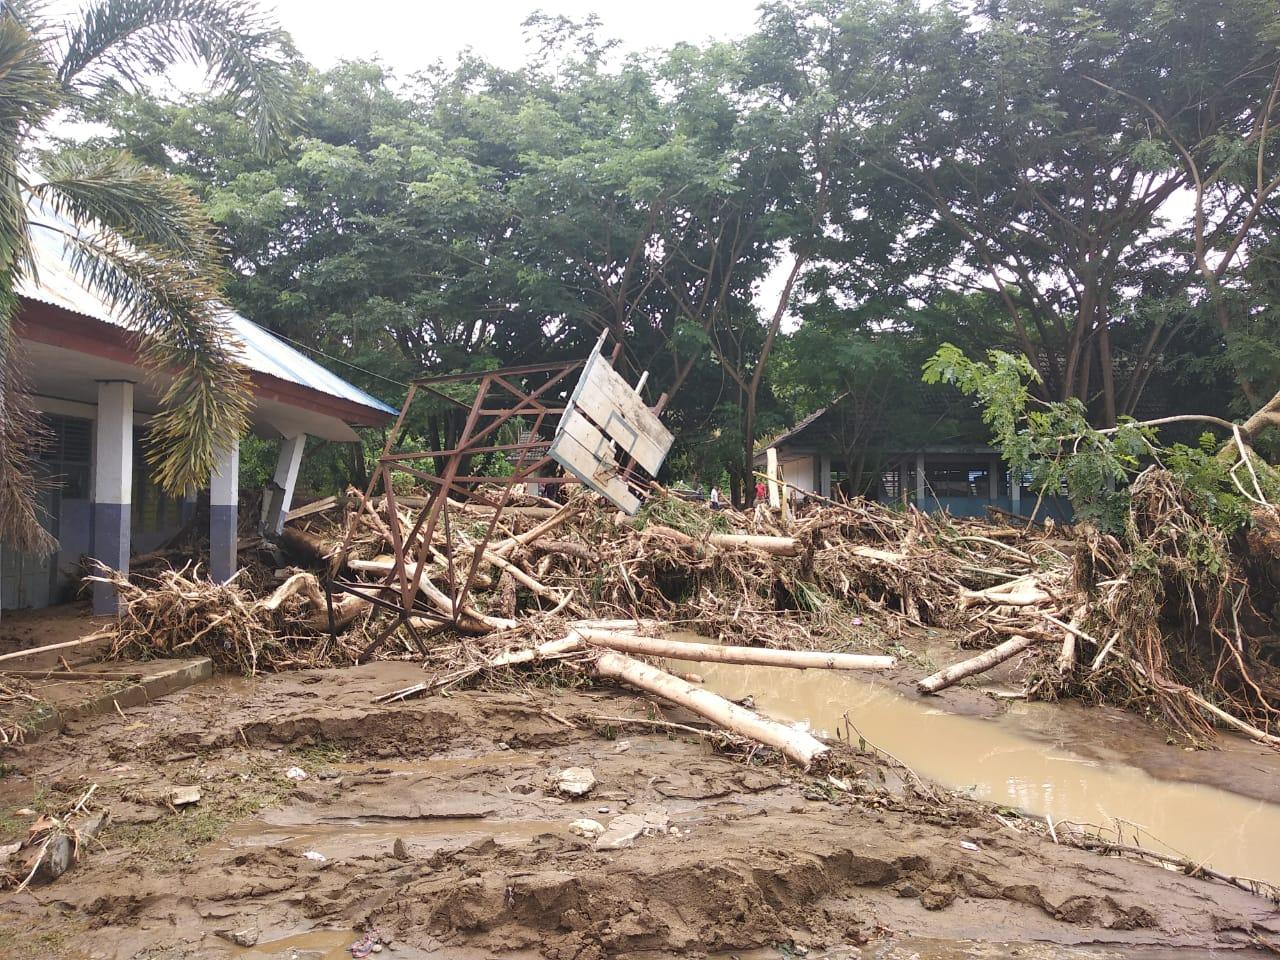 Banjir Mamuju: 10 Rumah Hanyut, Ratusan Rusak Berat